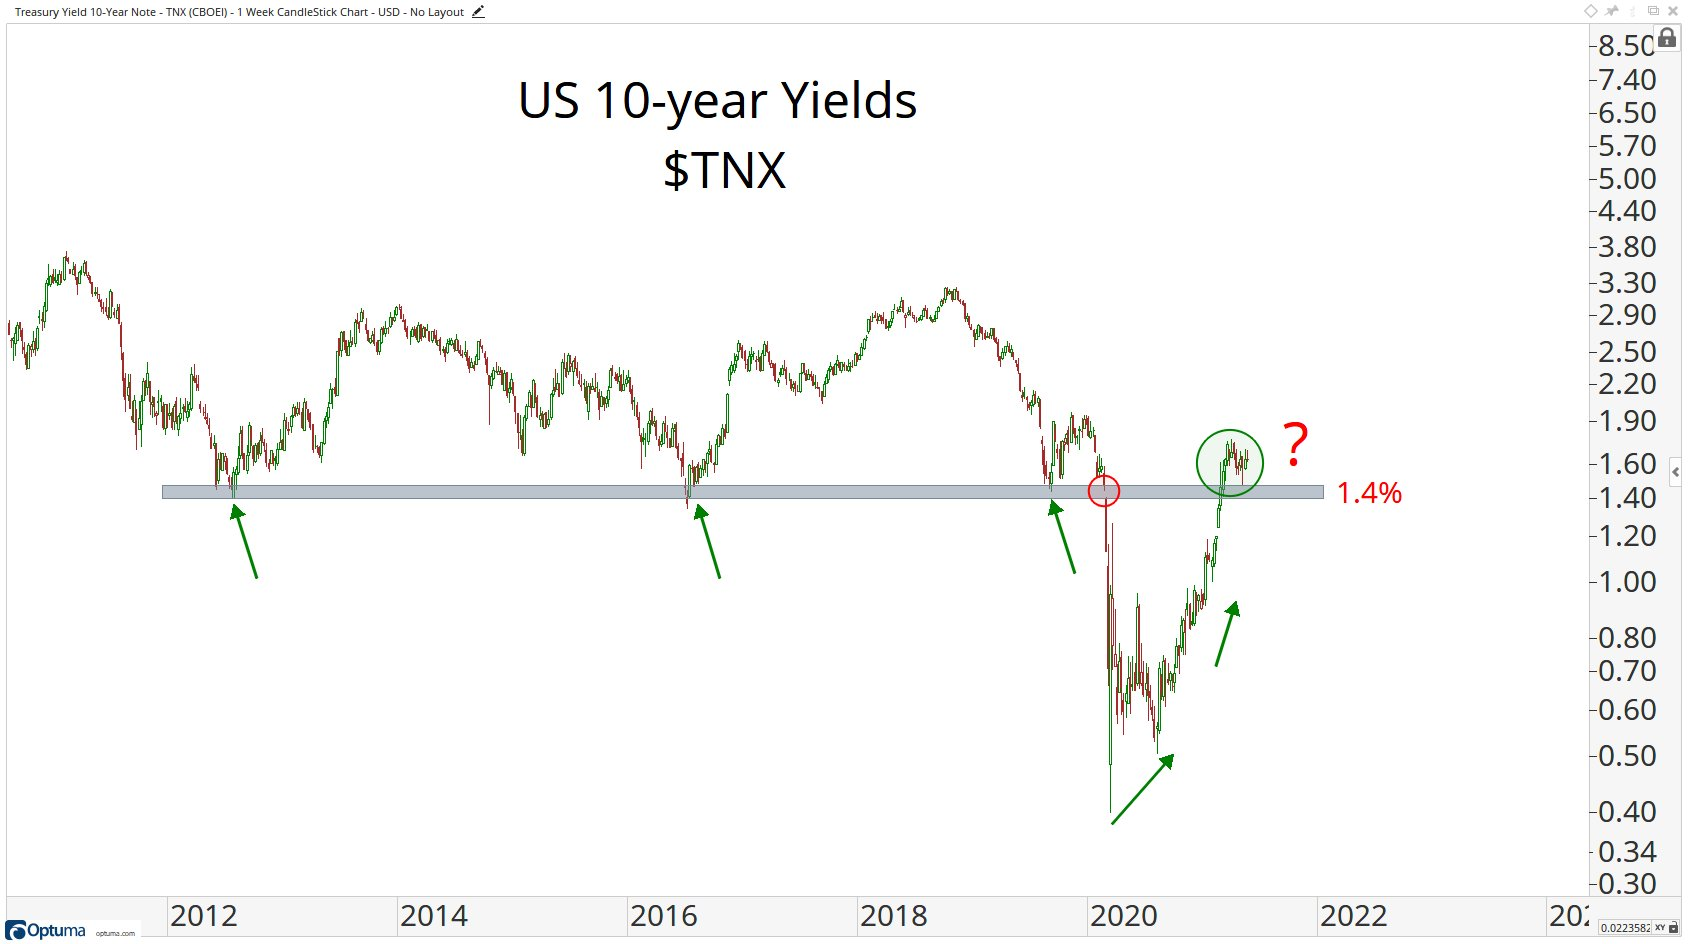 All eyes on 1.4% on the 10-YR Treasury Yield